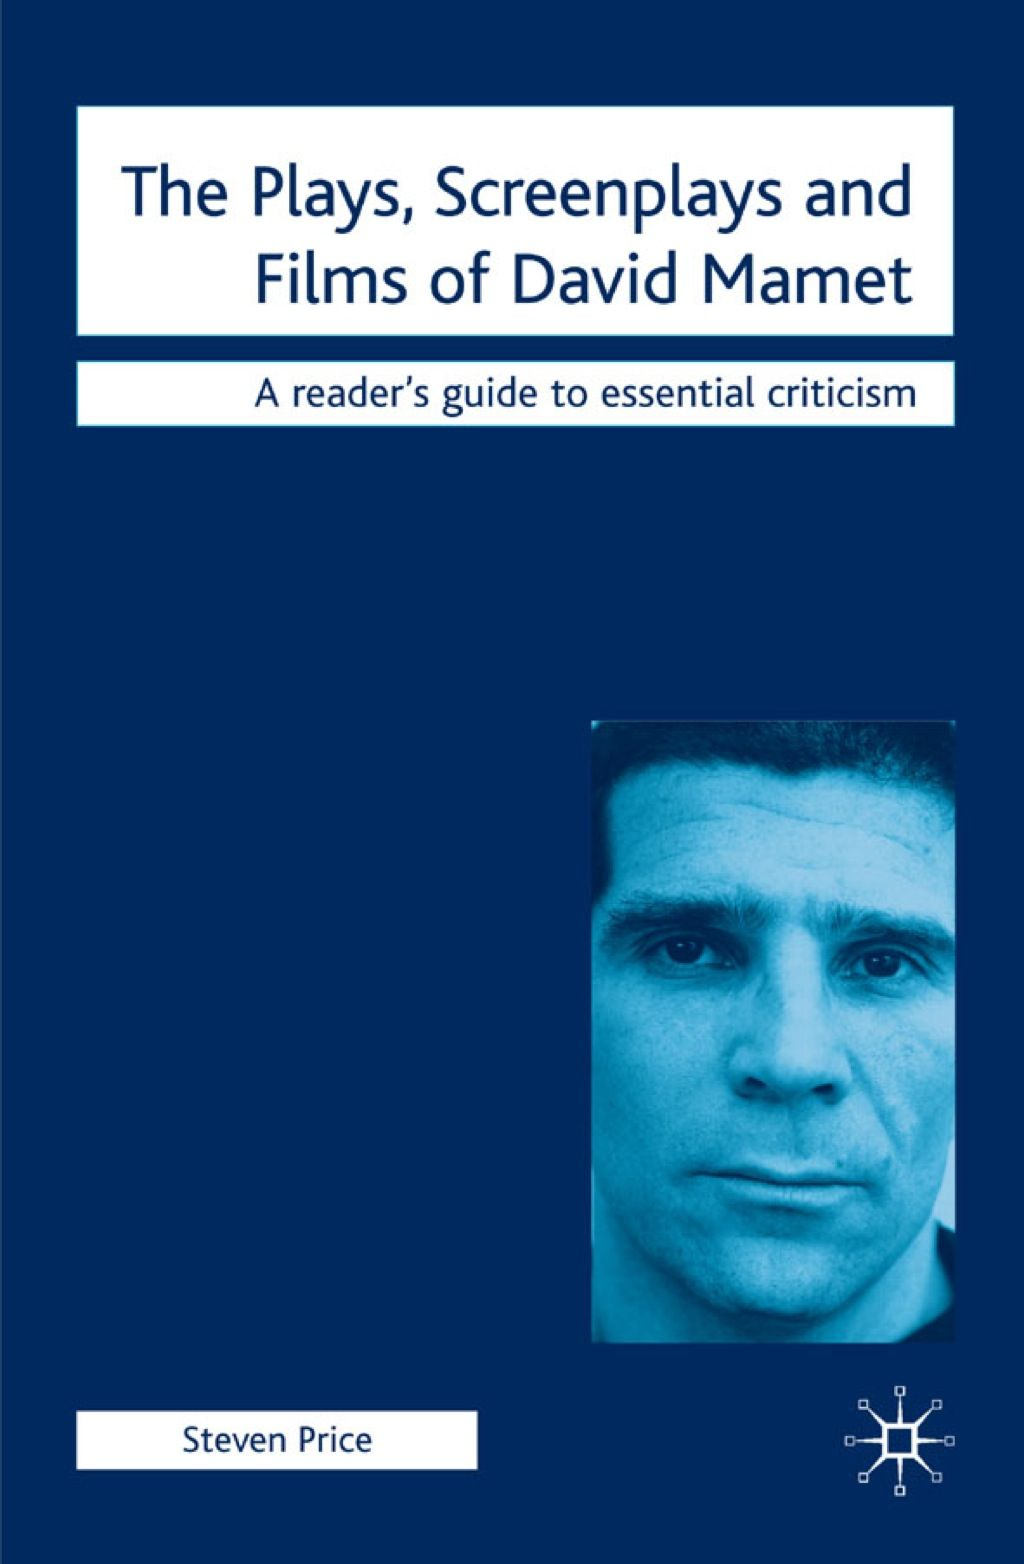 The Plays Screenplays And Films Of David Mamet Ebook Rental Screenplay Ebook Film